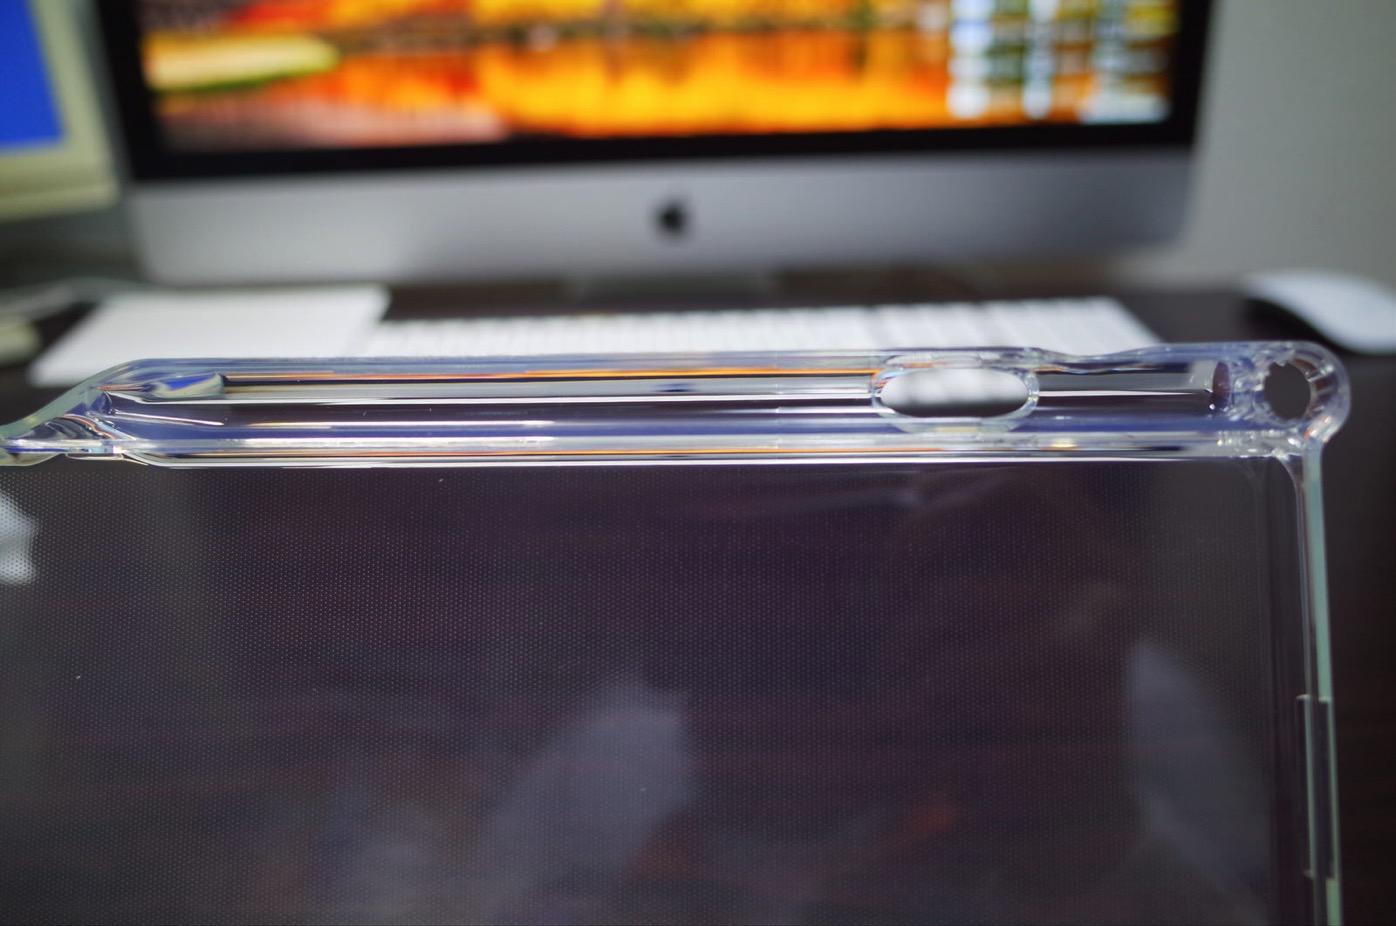 iPad Pro 10.5 ケース Poetic -[Lumos Series]- アップル 10.5型 アイパッド プロ 対応 [ウルトラスリム] [TPU製 ケース] Smart Keyboard 対応 Apple Pencil 収納スロット付き (クリスタルクリア)-5